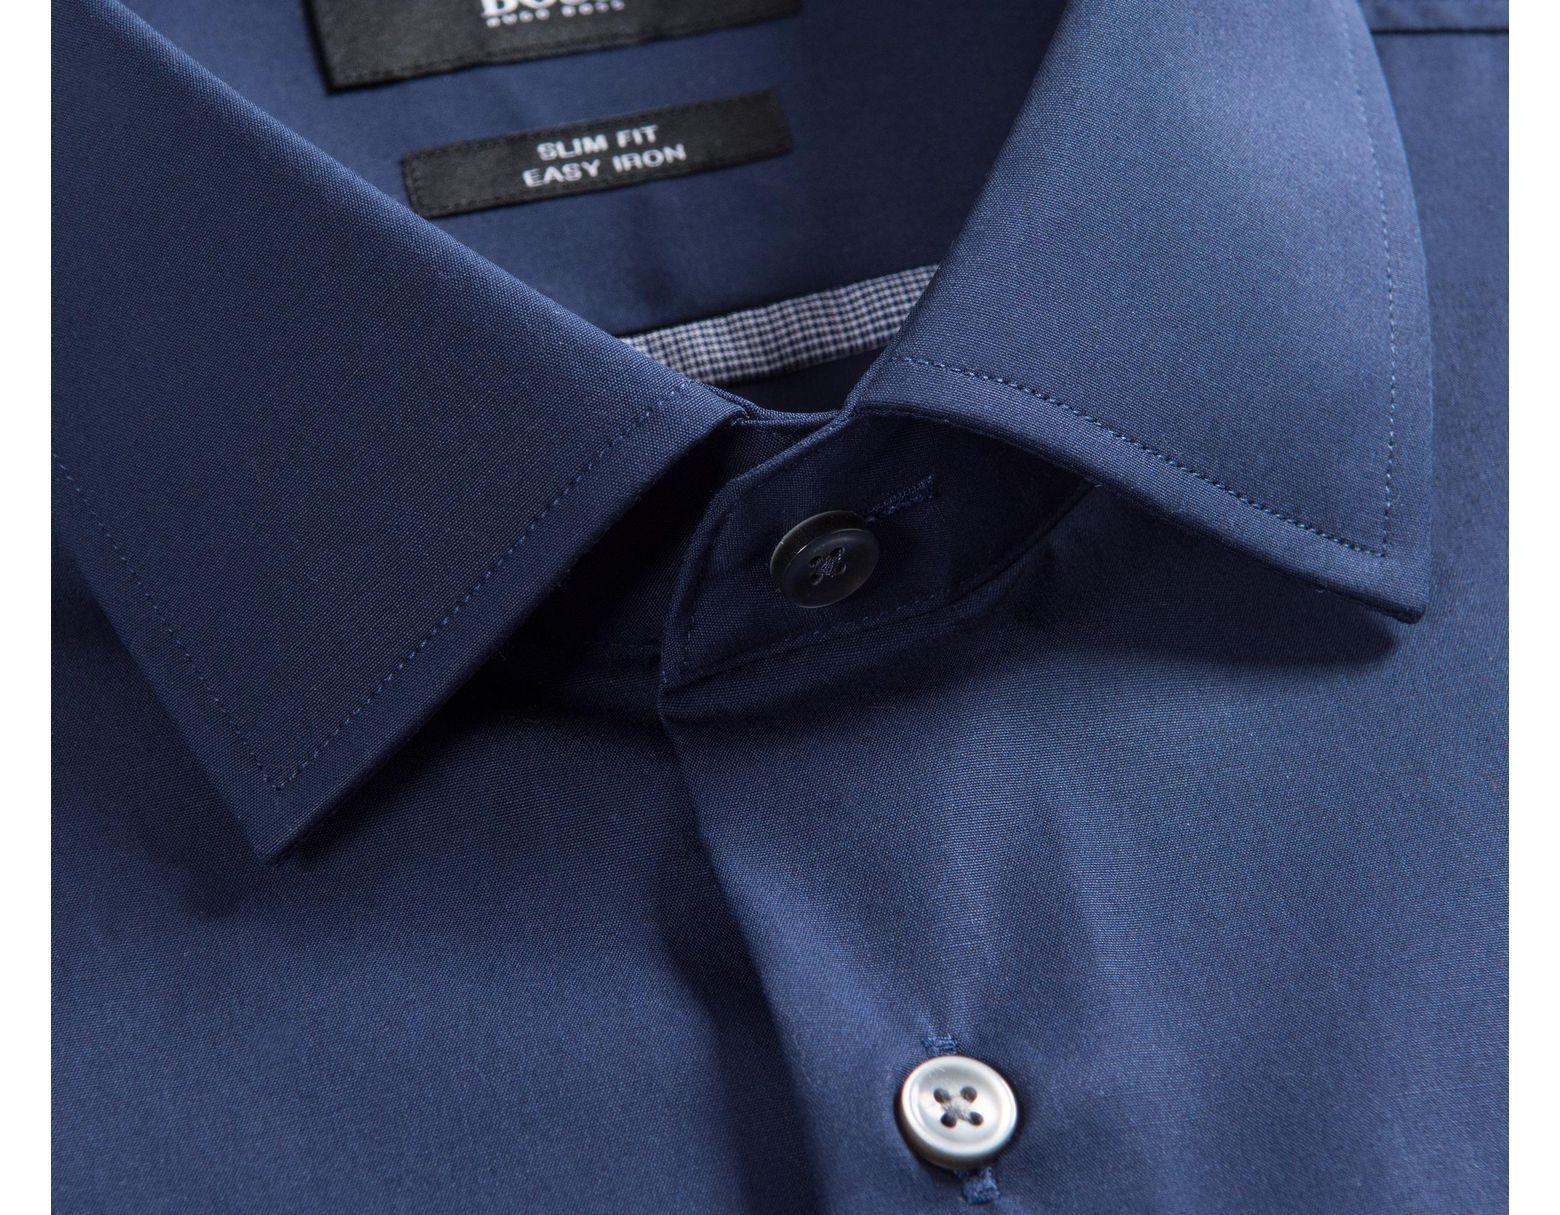 bed23d327 BOSS 'jerris' Easy Iron Formal Shirt Navy in Blue for Men - Lyst